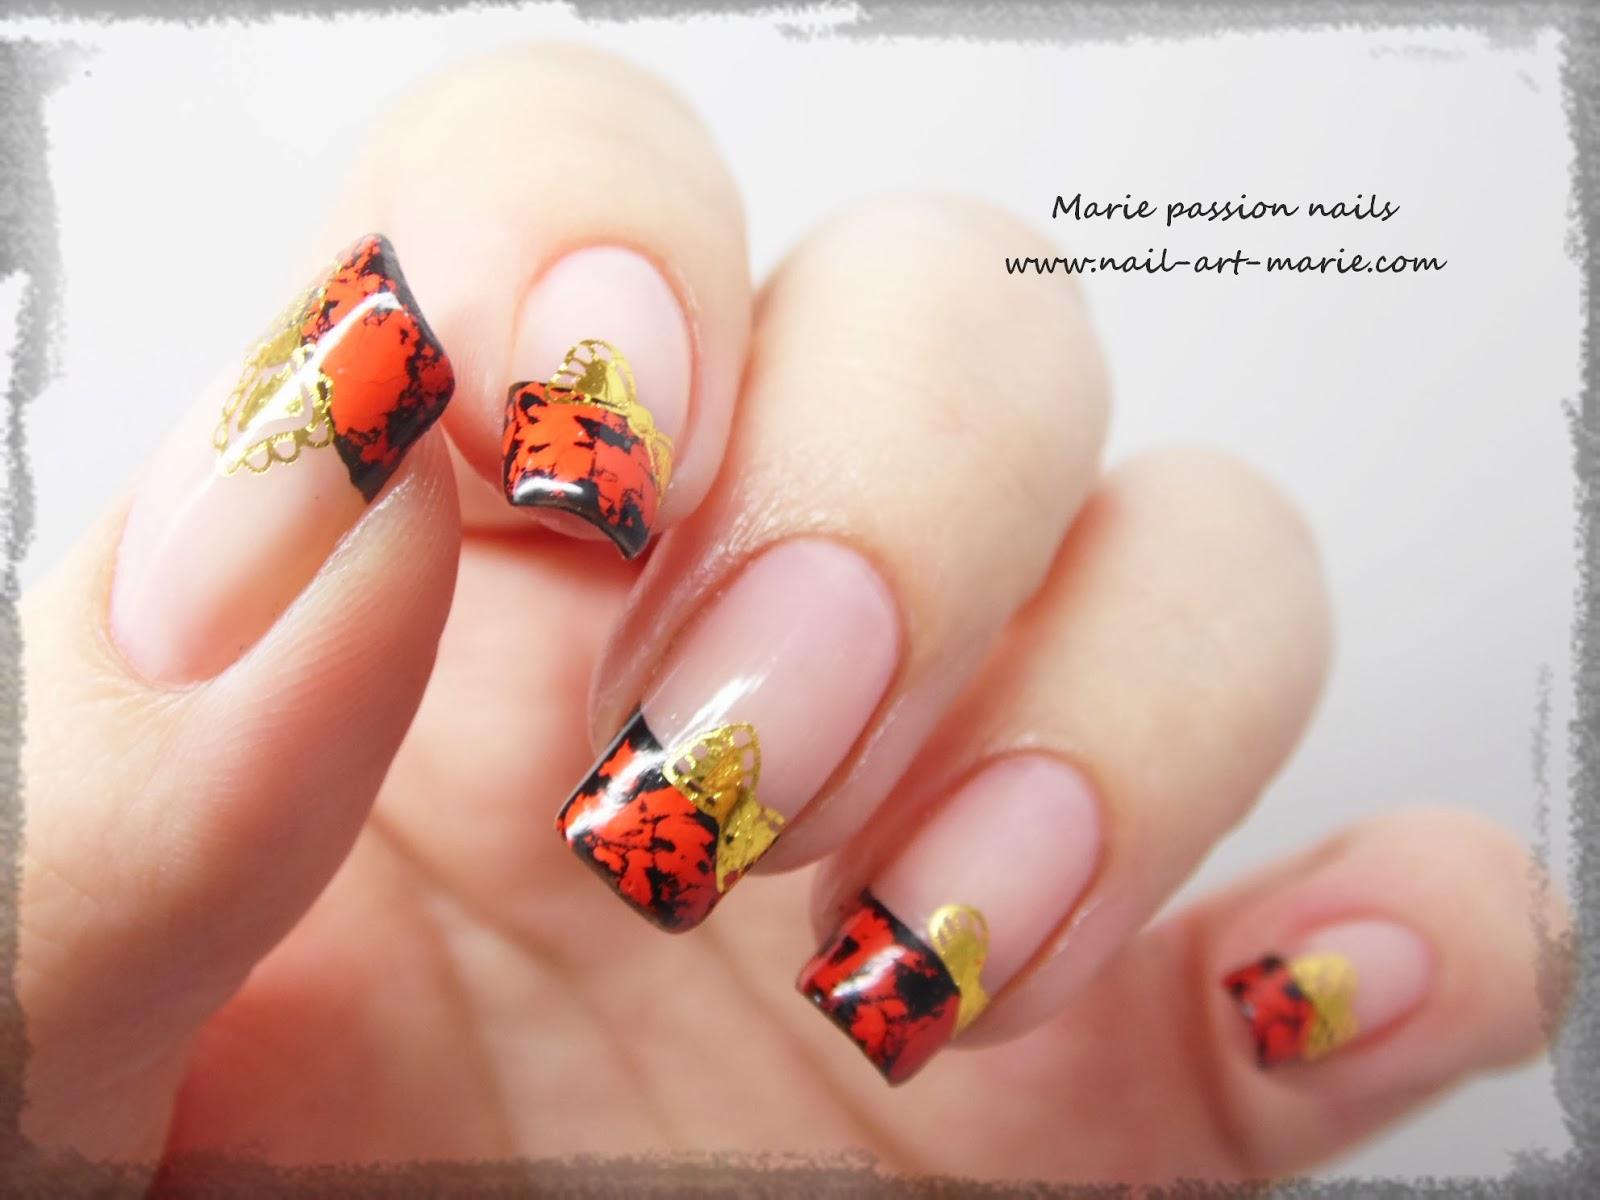 Nail Art avec craquelures de foils matte8